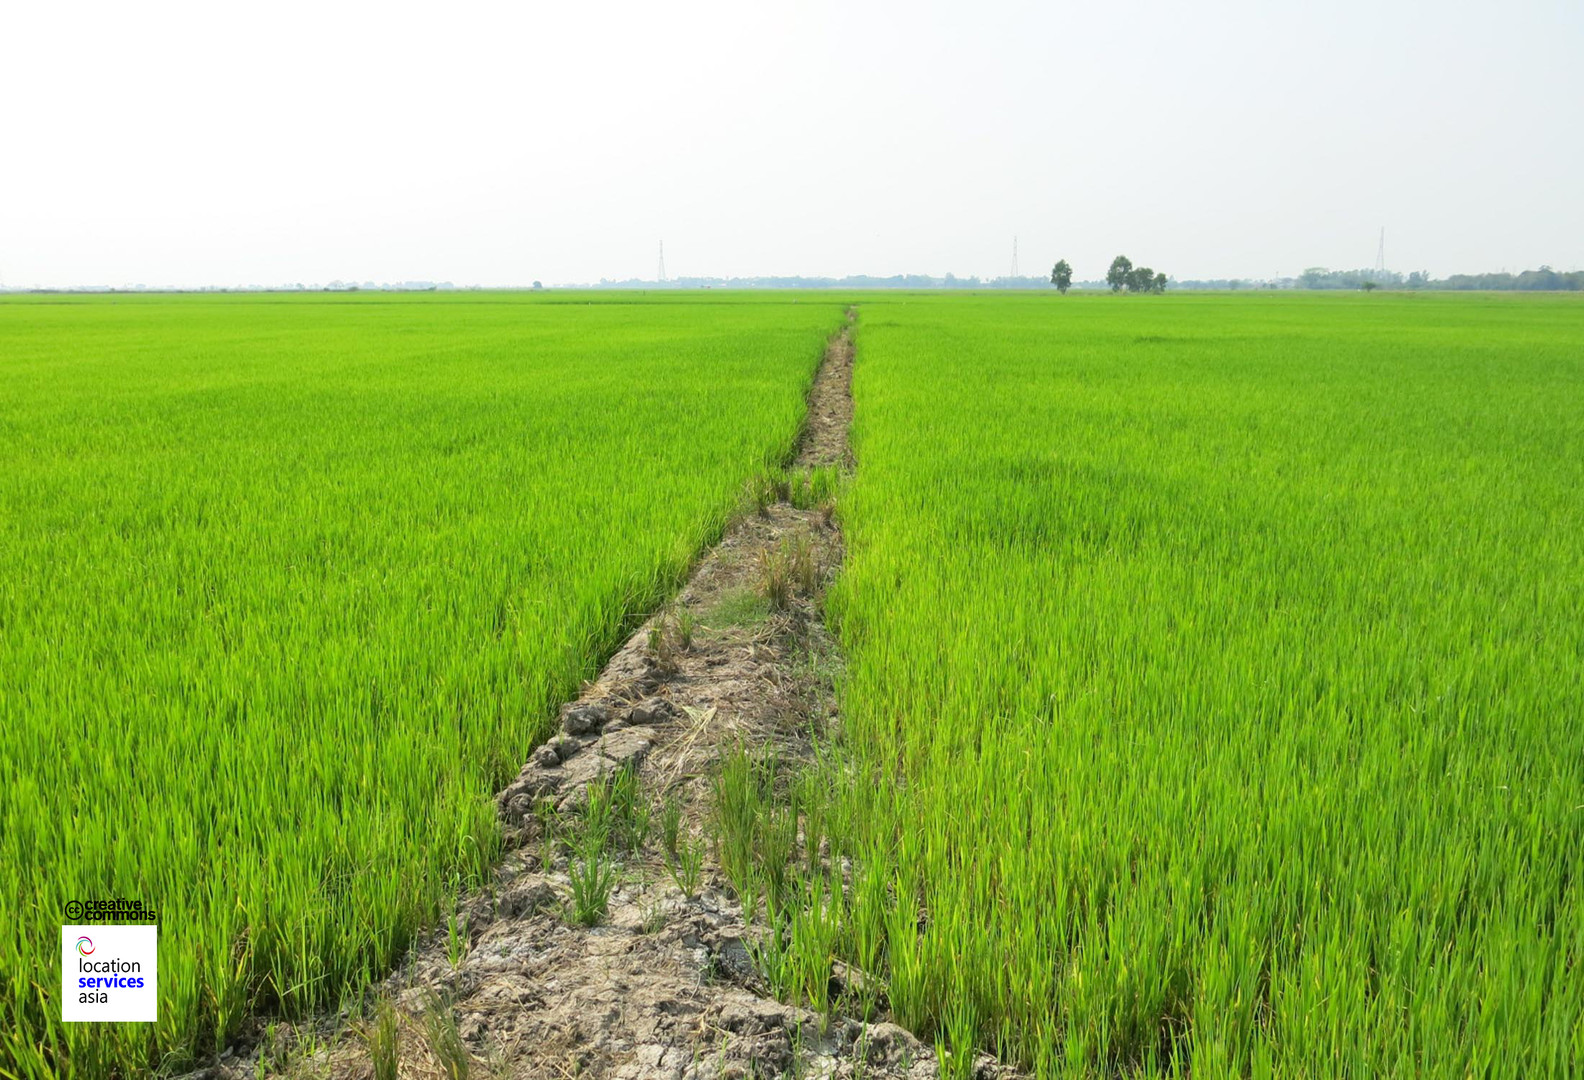 thai film locations farms fields c.jpg